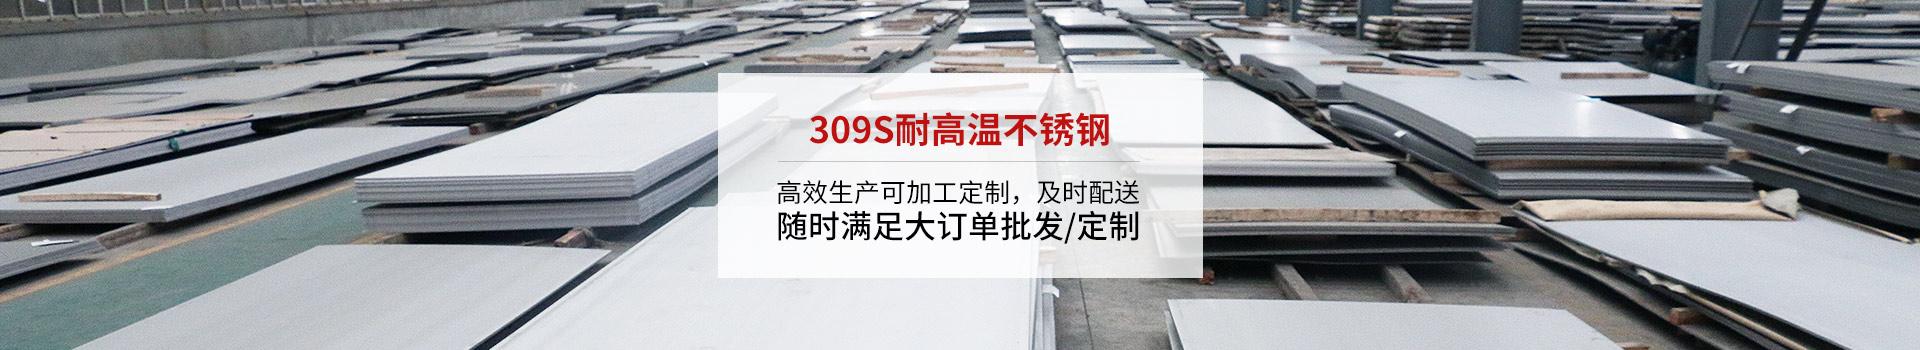 309s耐高温不锈钢,高效生产可加工定制